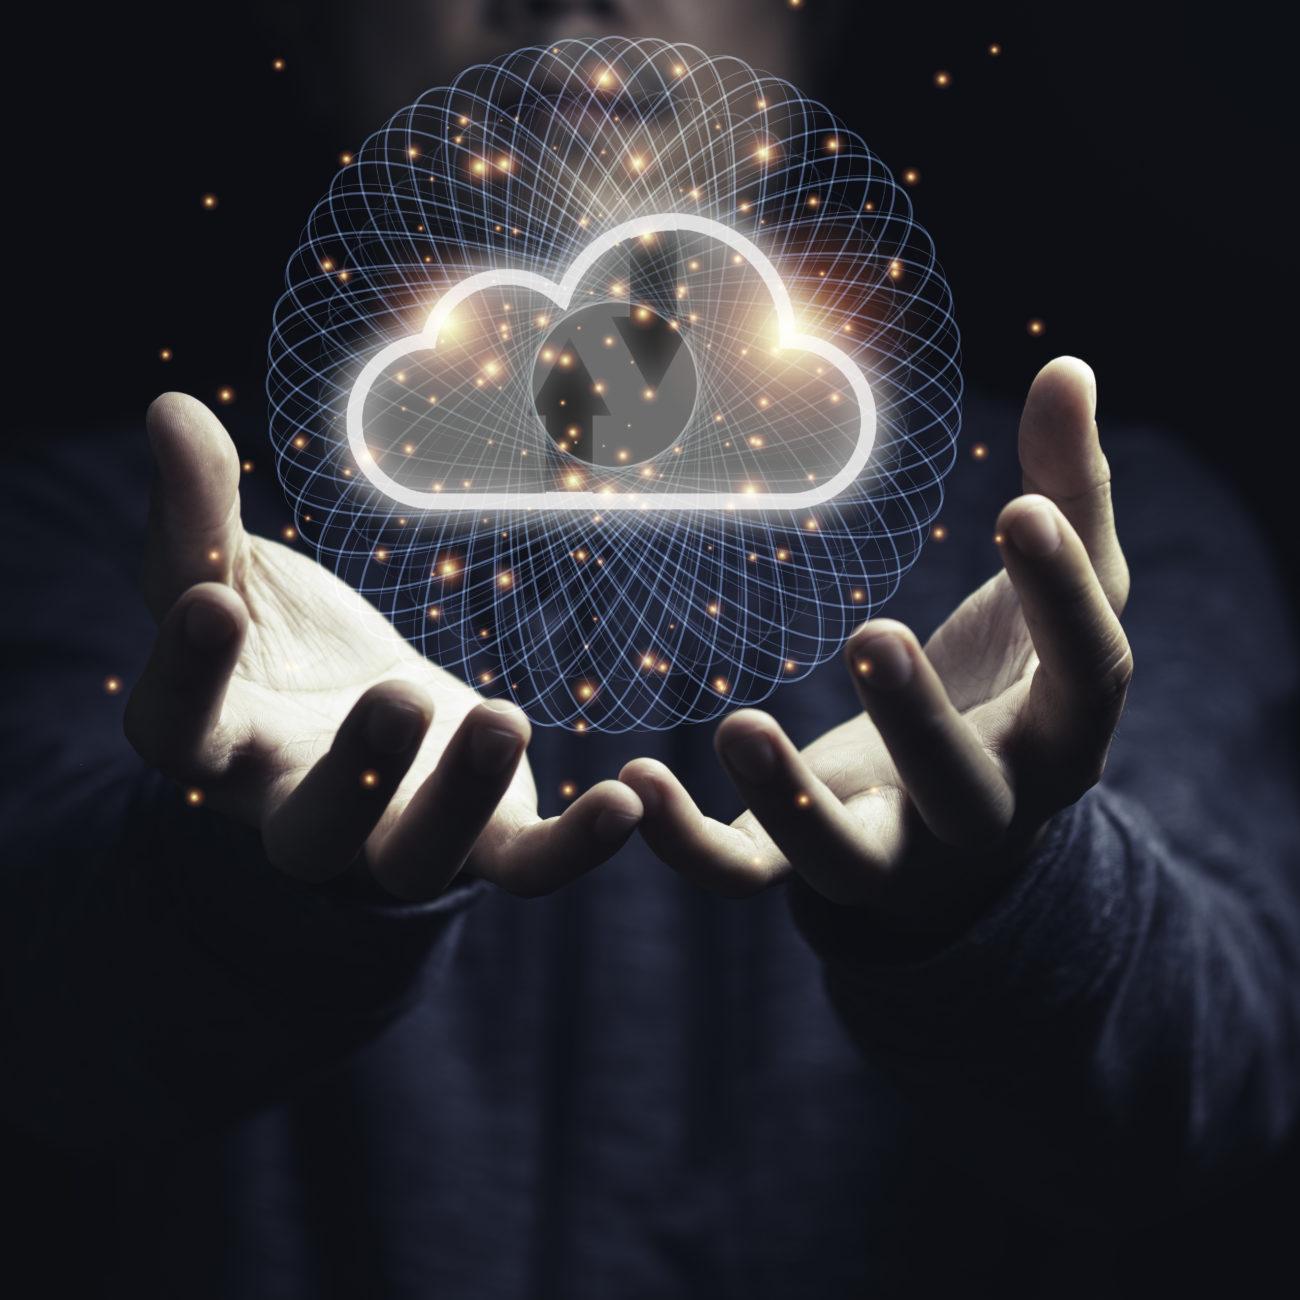 le cloud ou nuage virtuel